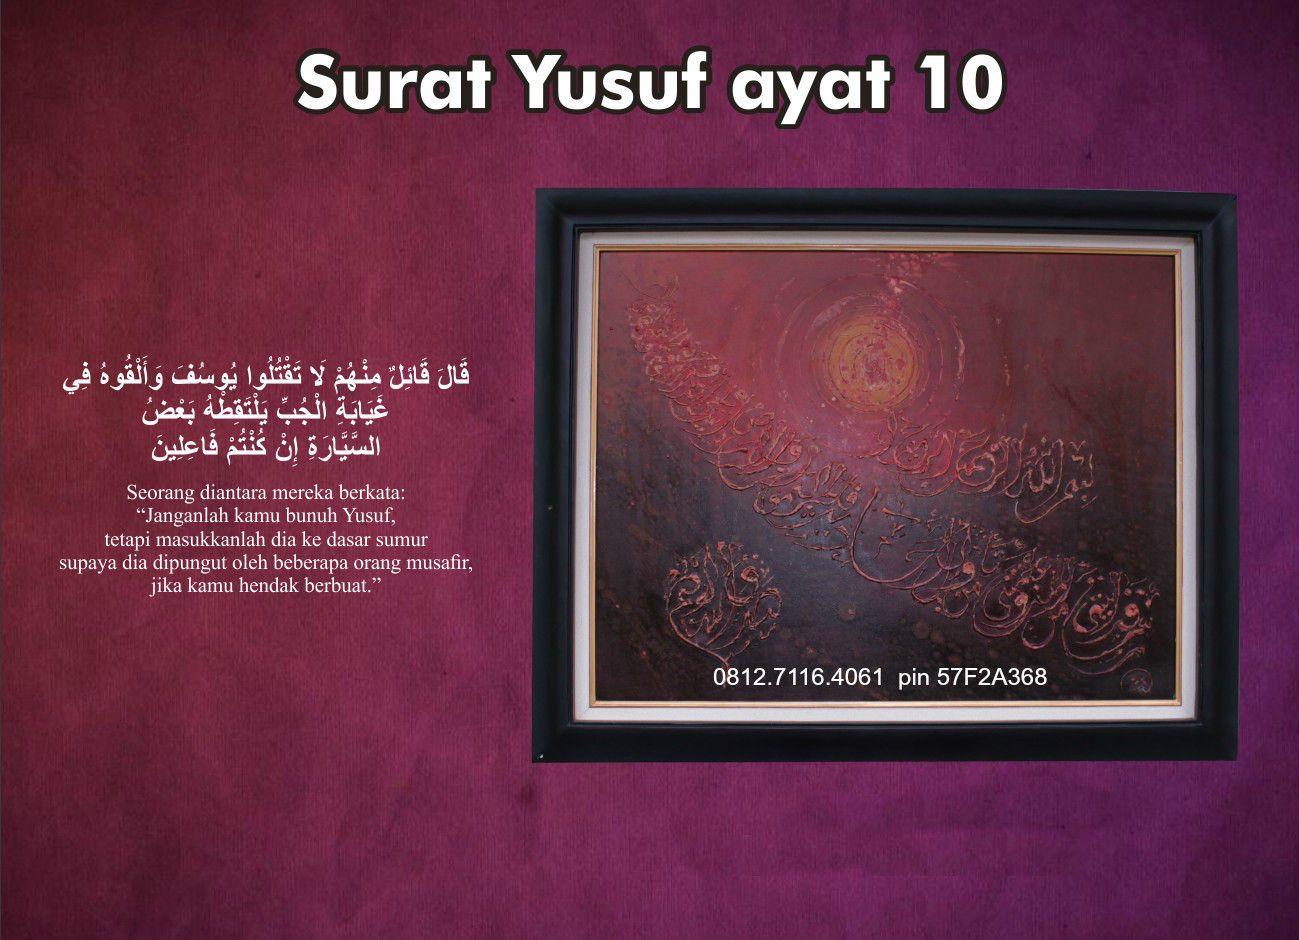 Kaligrafi Arab bikinan tangan / handmade bertekstur khas